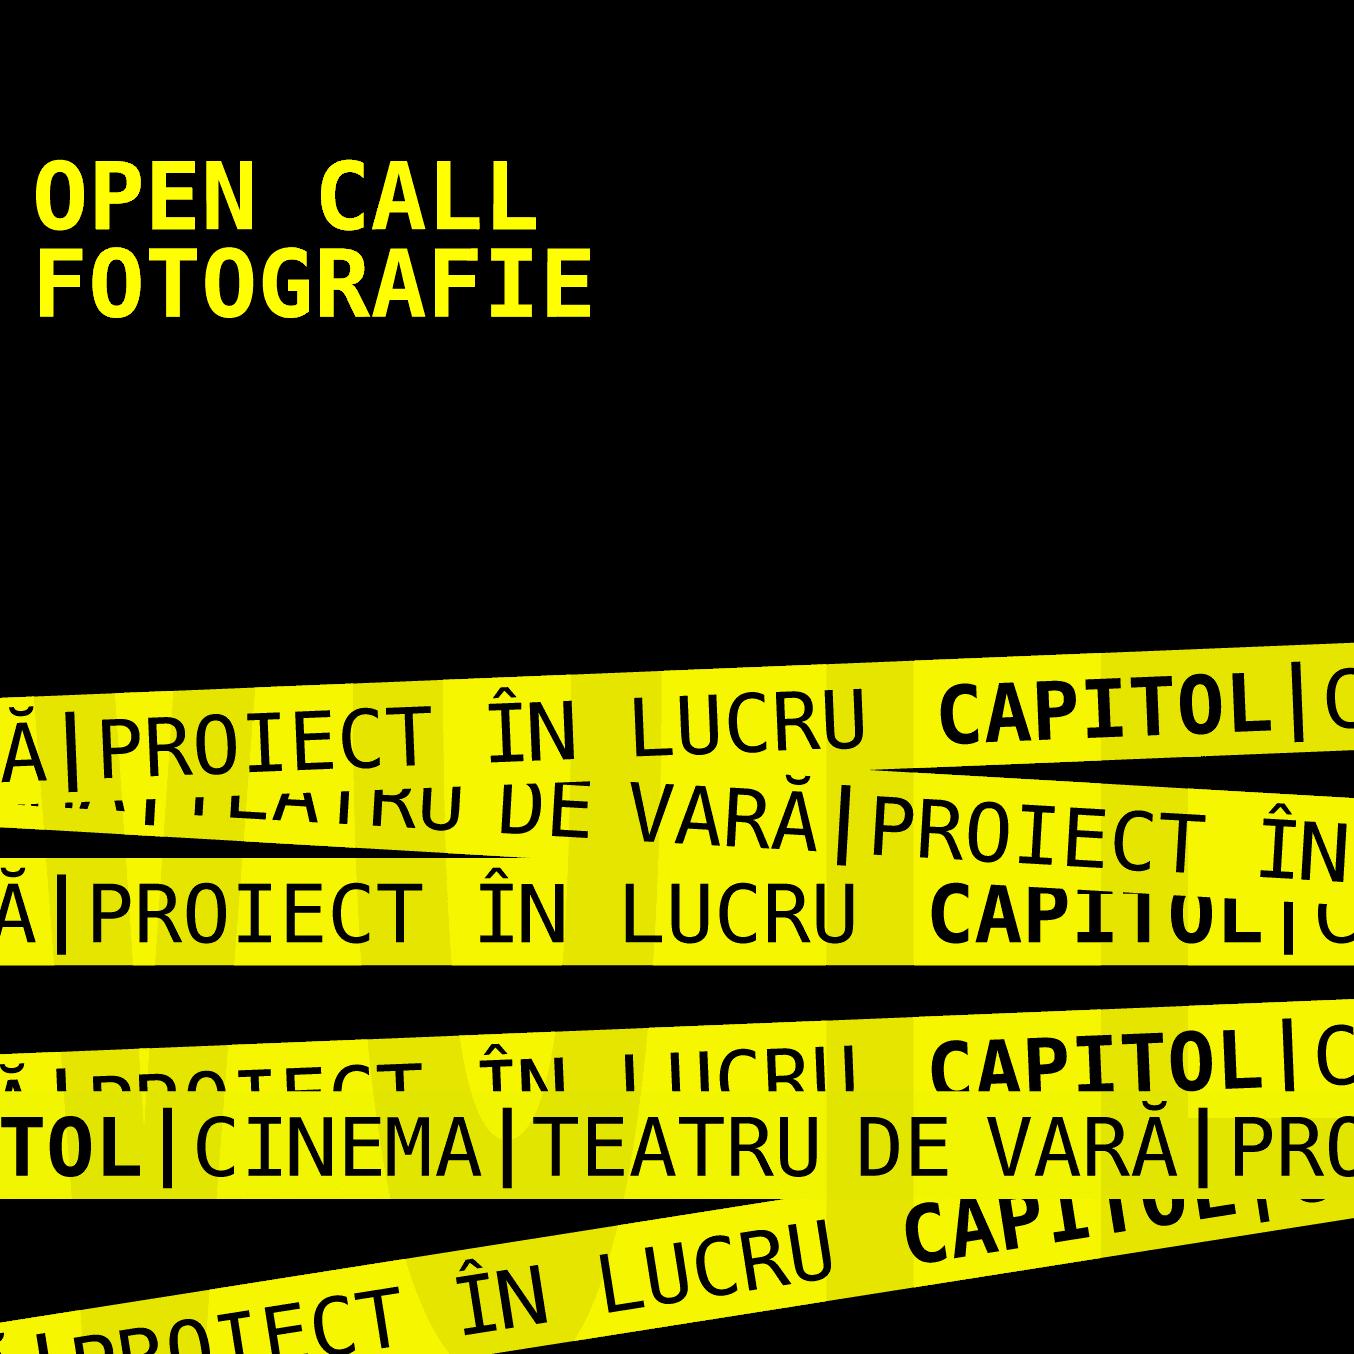 CAPITOL vote open call fotografie